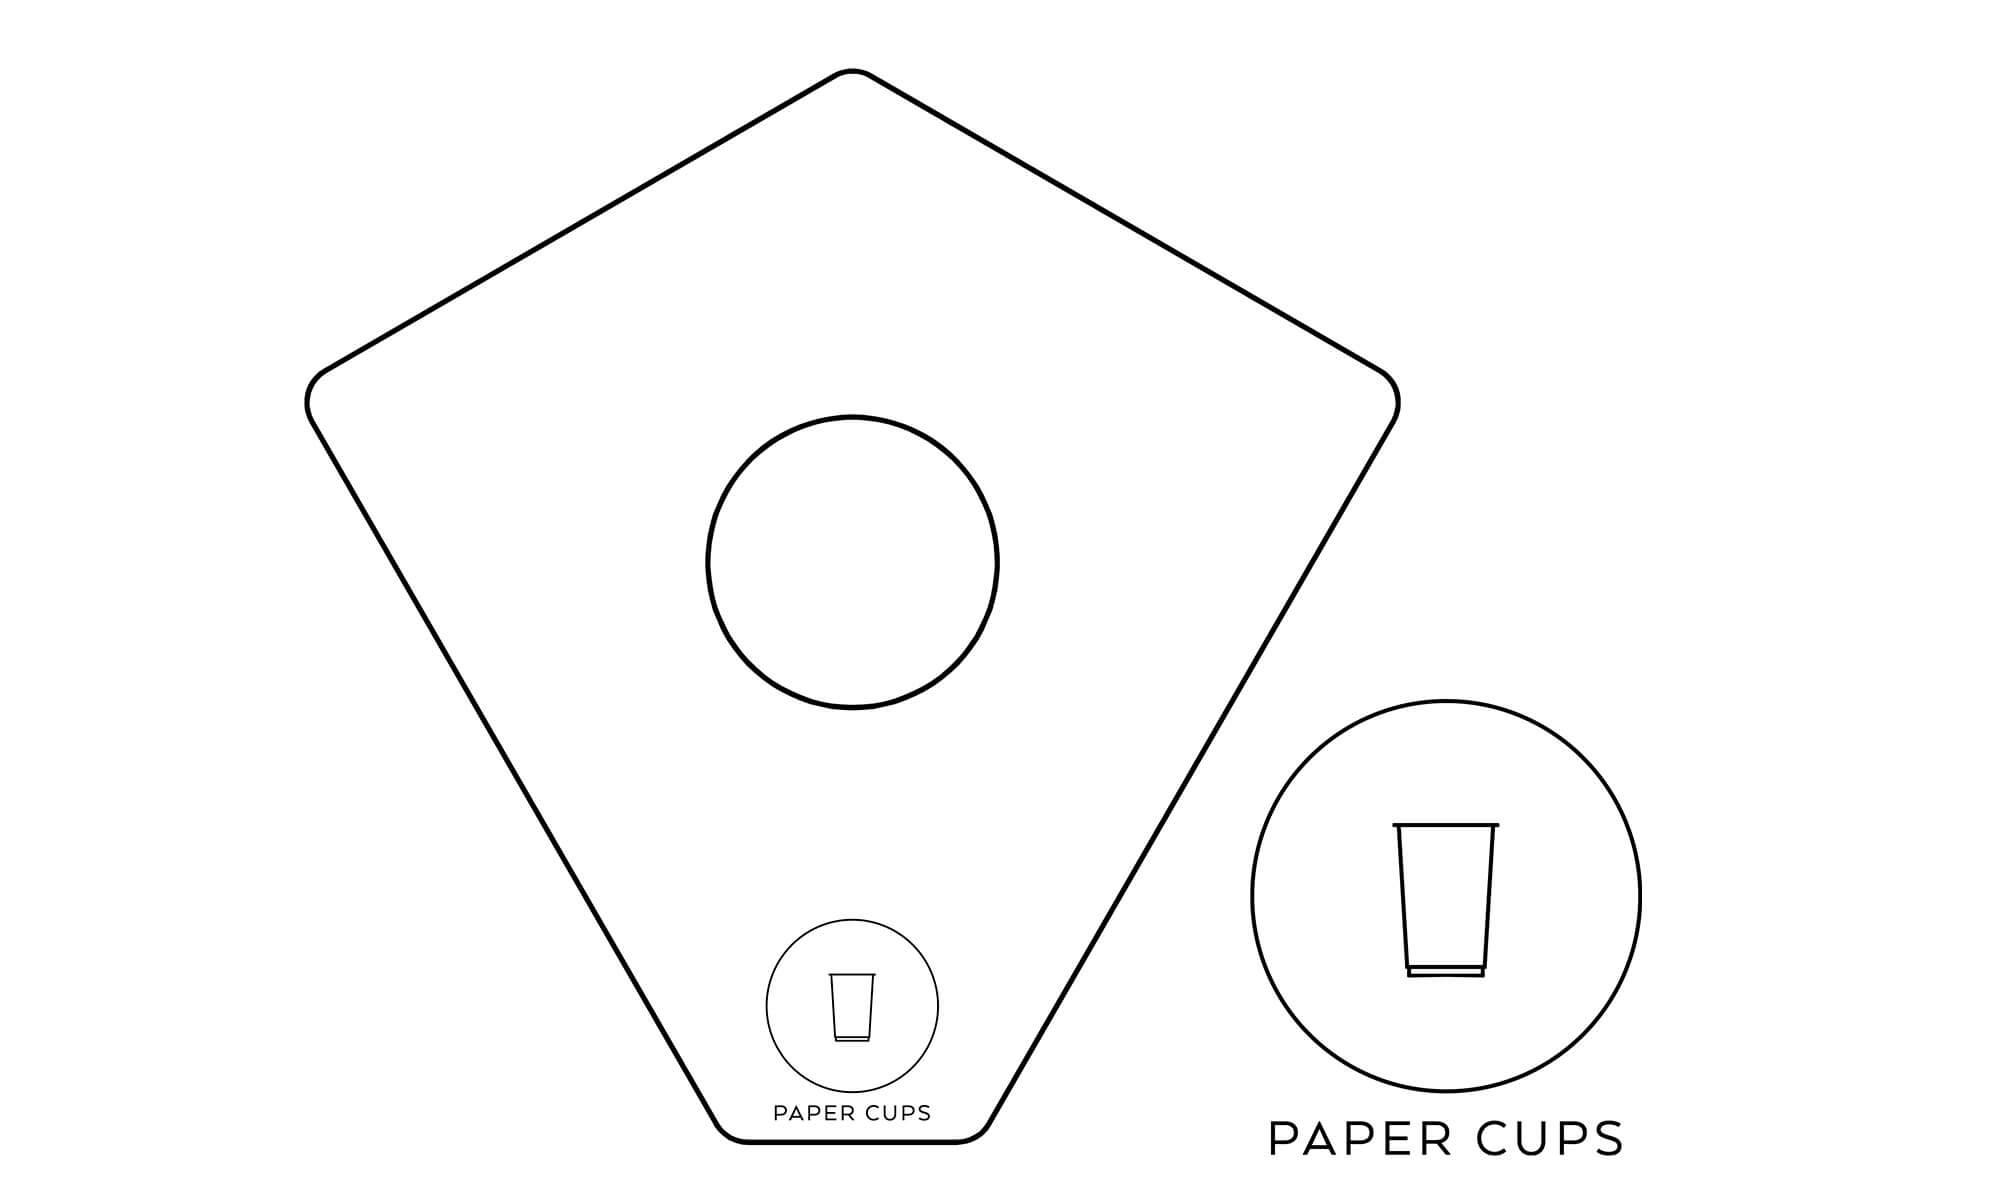 källsortering pappers muggar kite recycling paper cups